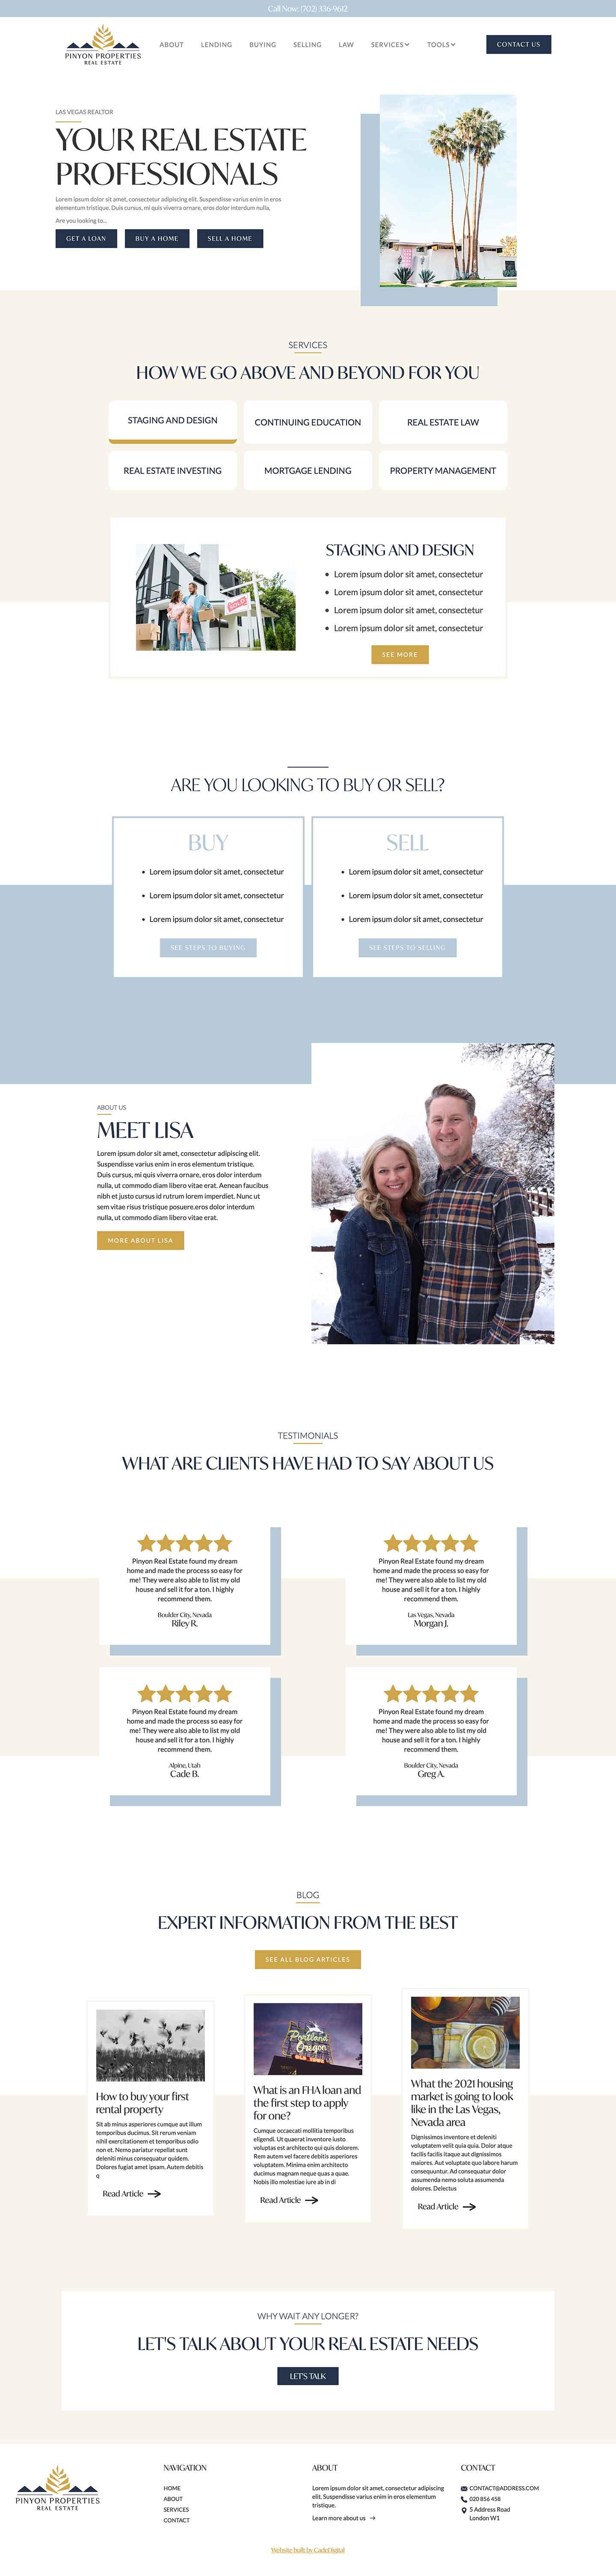 Custom web design for a real estate agent